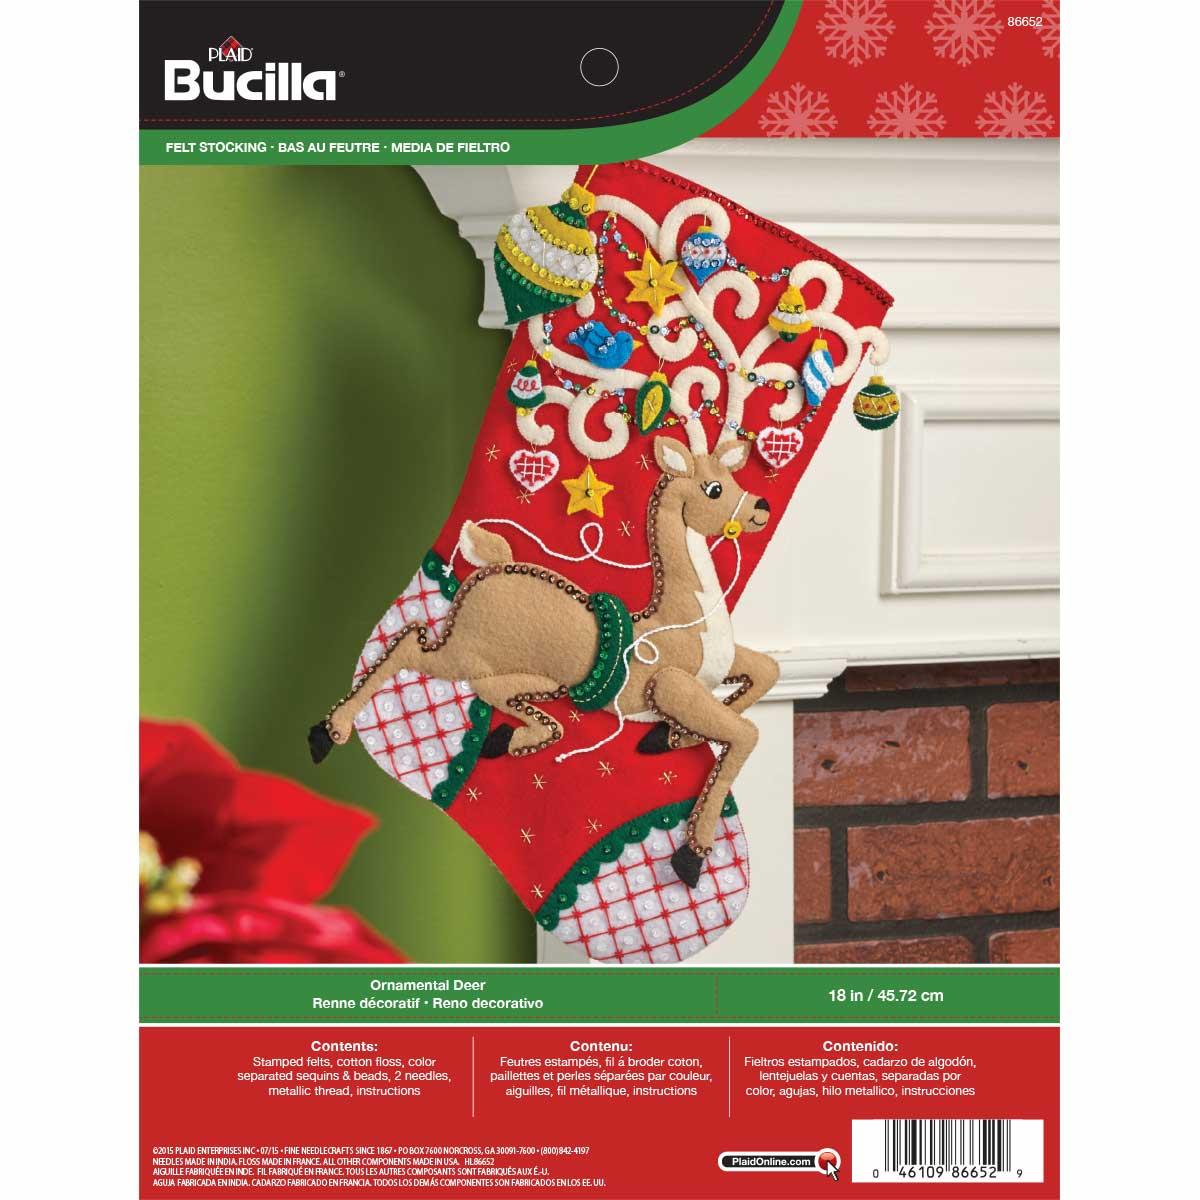 Bucilla ® Seasonal - Felt - Stocking Kits - Ornamental Deer - 86652